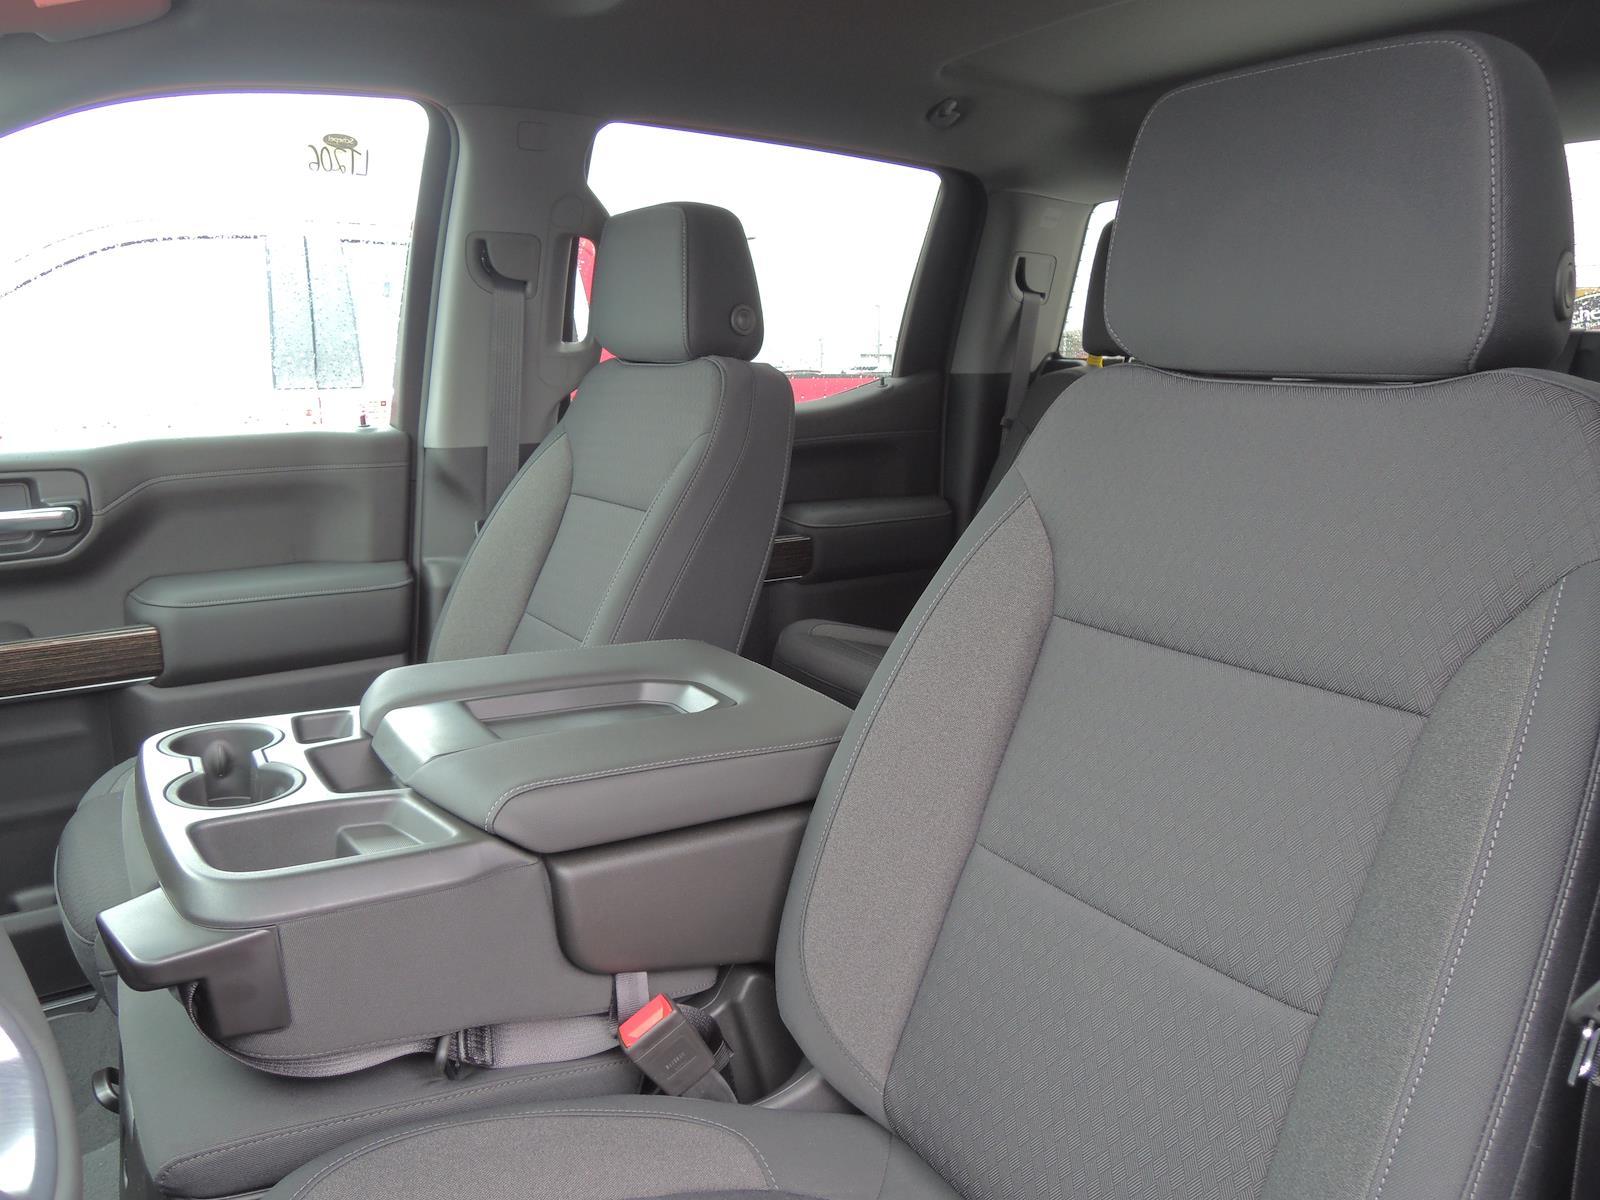 2021 GMC Sierra 1500 Crew Cab 4x4, Pickup #MT636 - photo 12